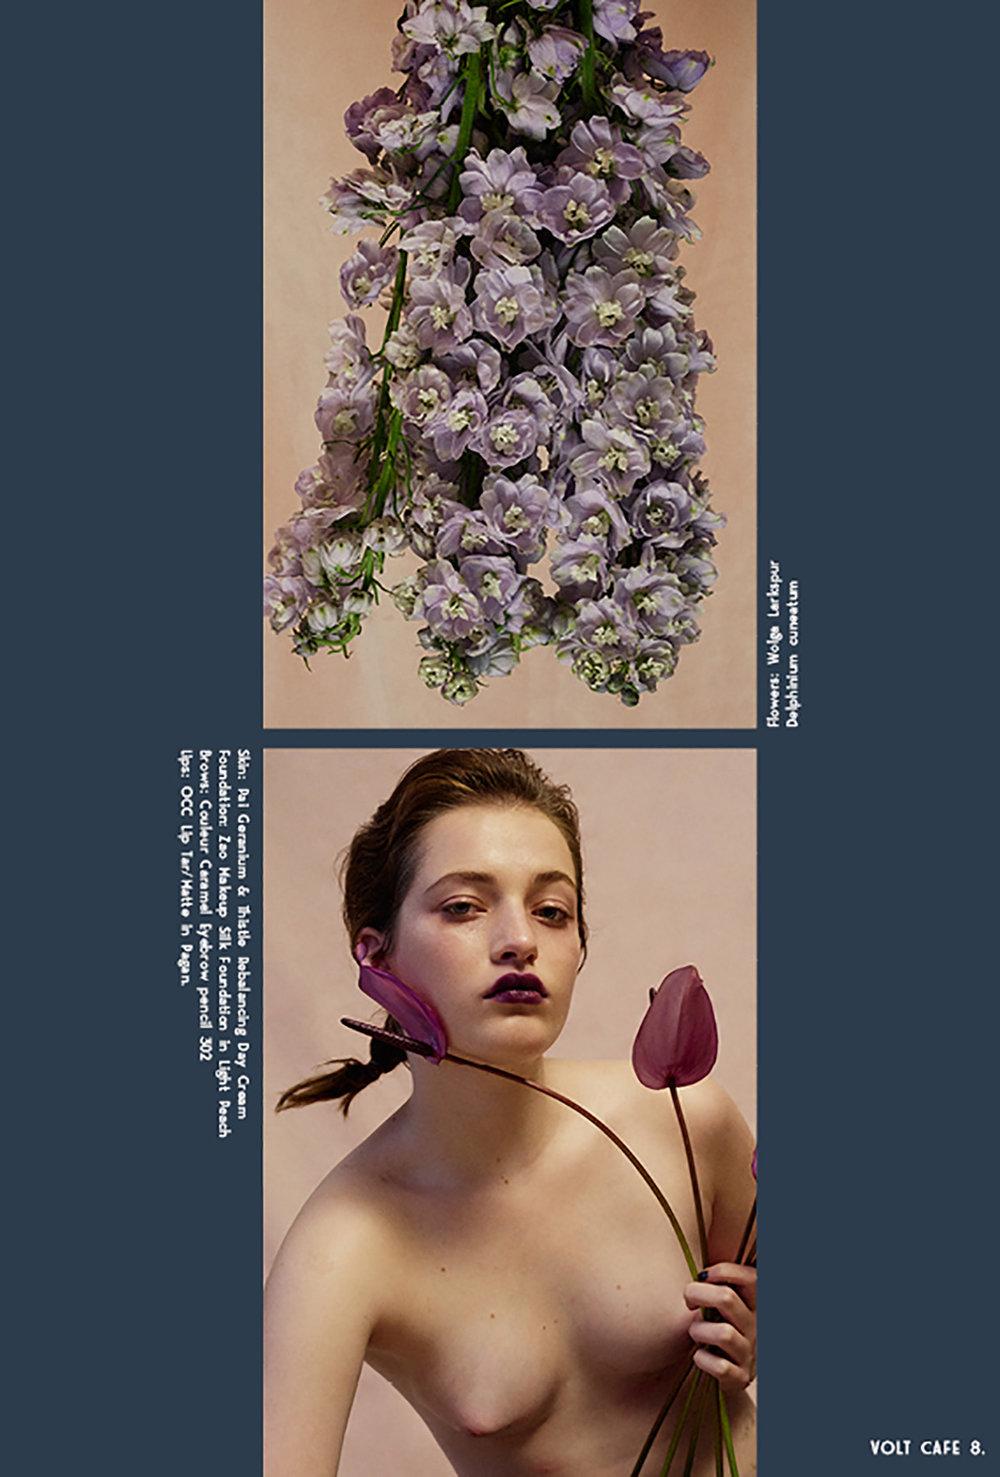 036-icon-artist-management-Kristin-Vicari-Beauty-Volt.jpg